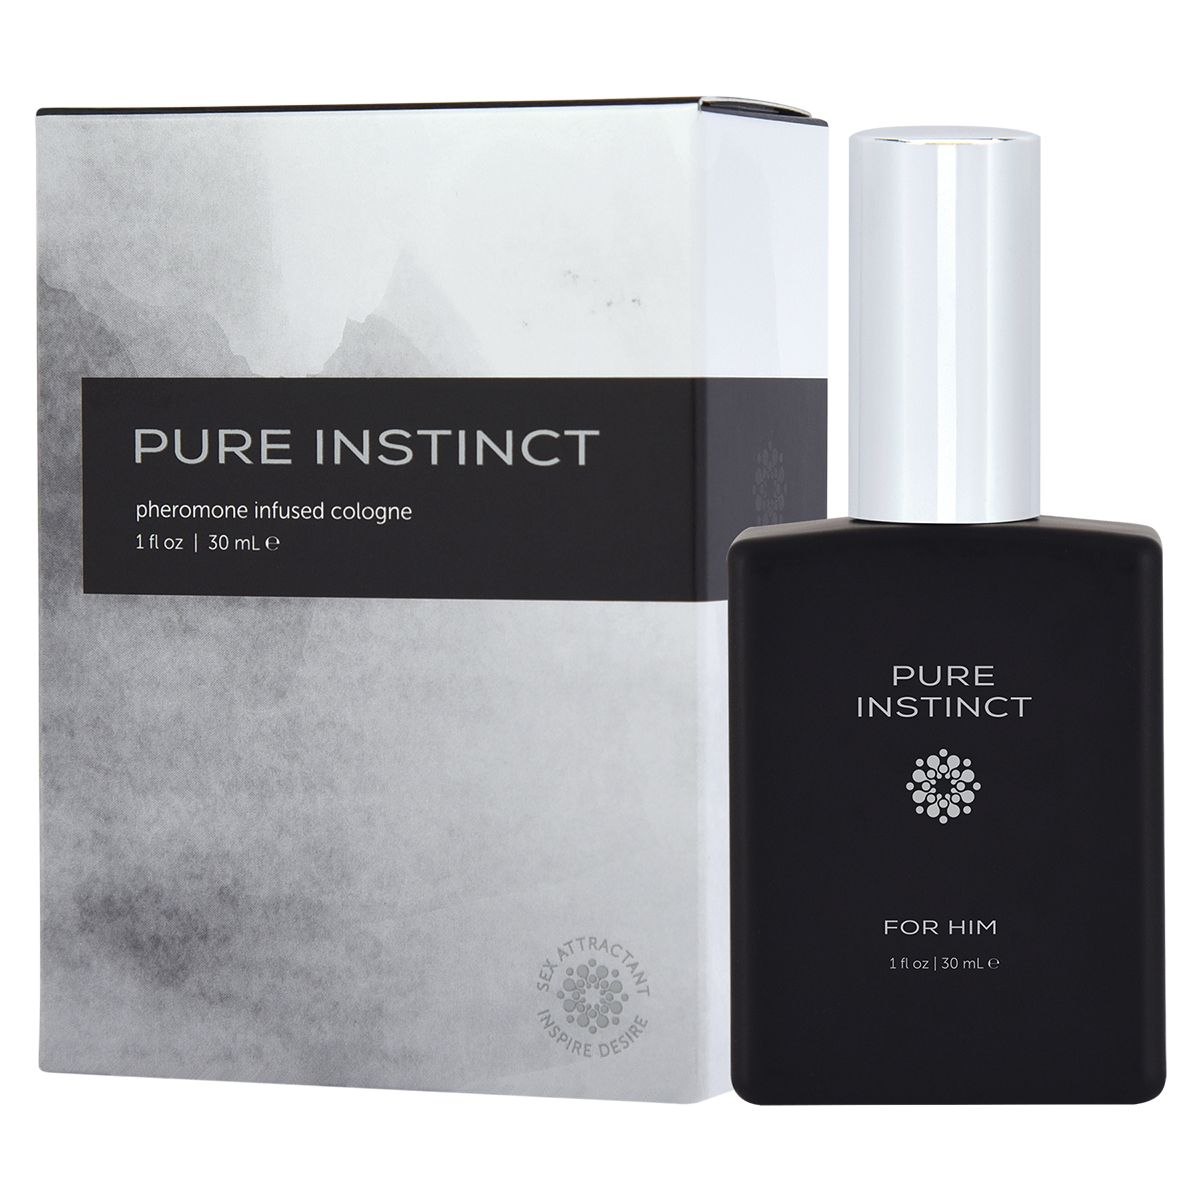 Мужские духи с феромонами Pure Instinct - 30 мл.